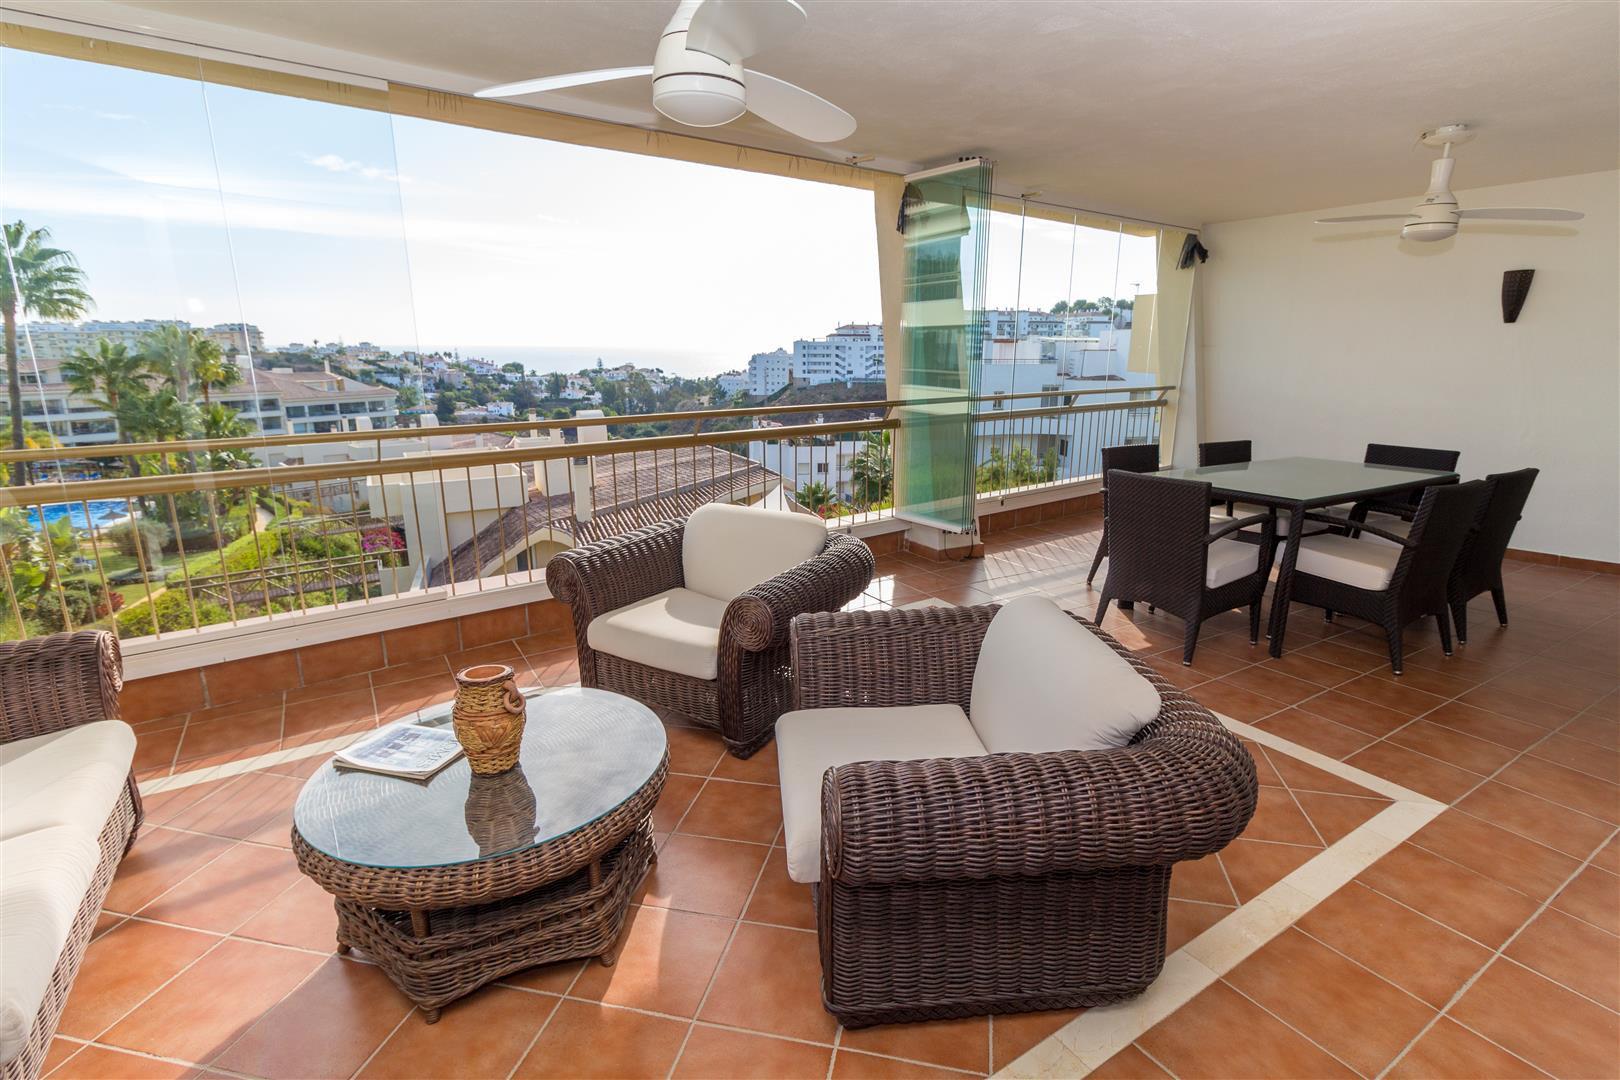 Apartment for sale in Mijas, Las Olas